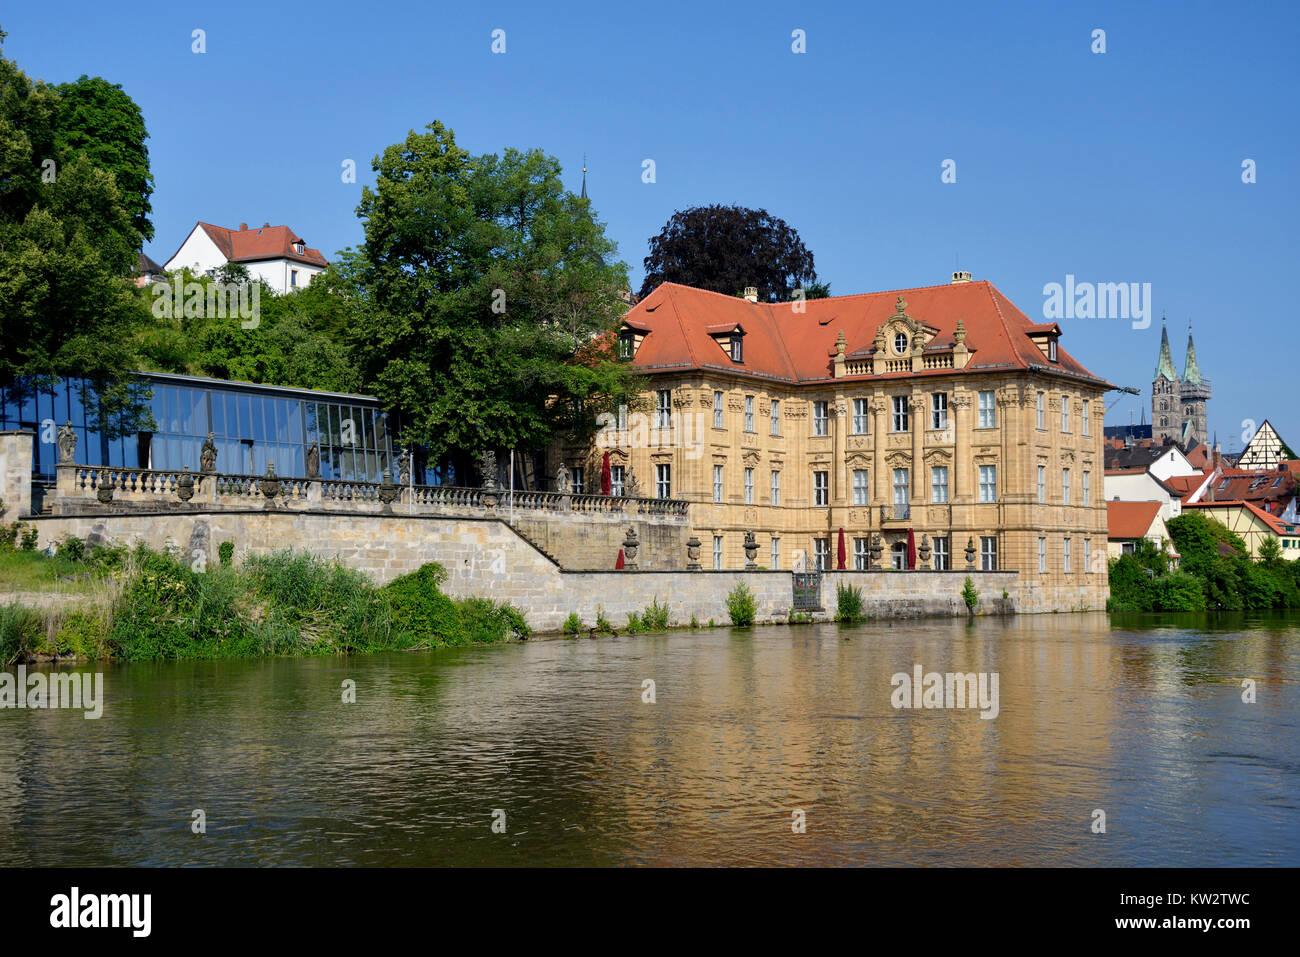 international artist's house Villa Concordia in Bamberg, Bamberg,  internationales Kuenstlerhaus Villa Concordia - Stock Image